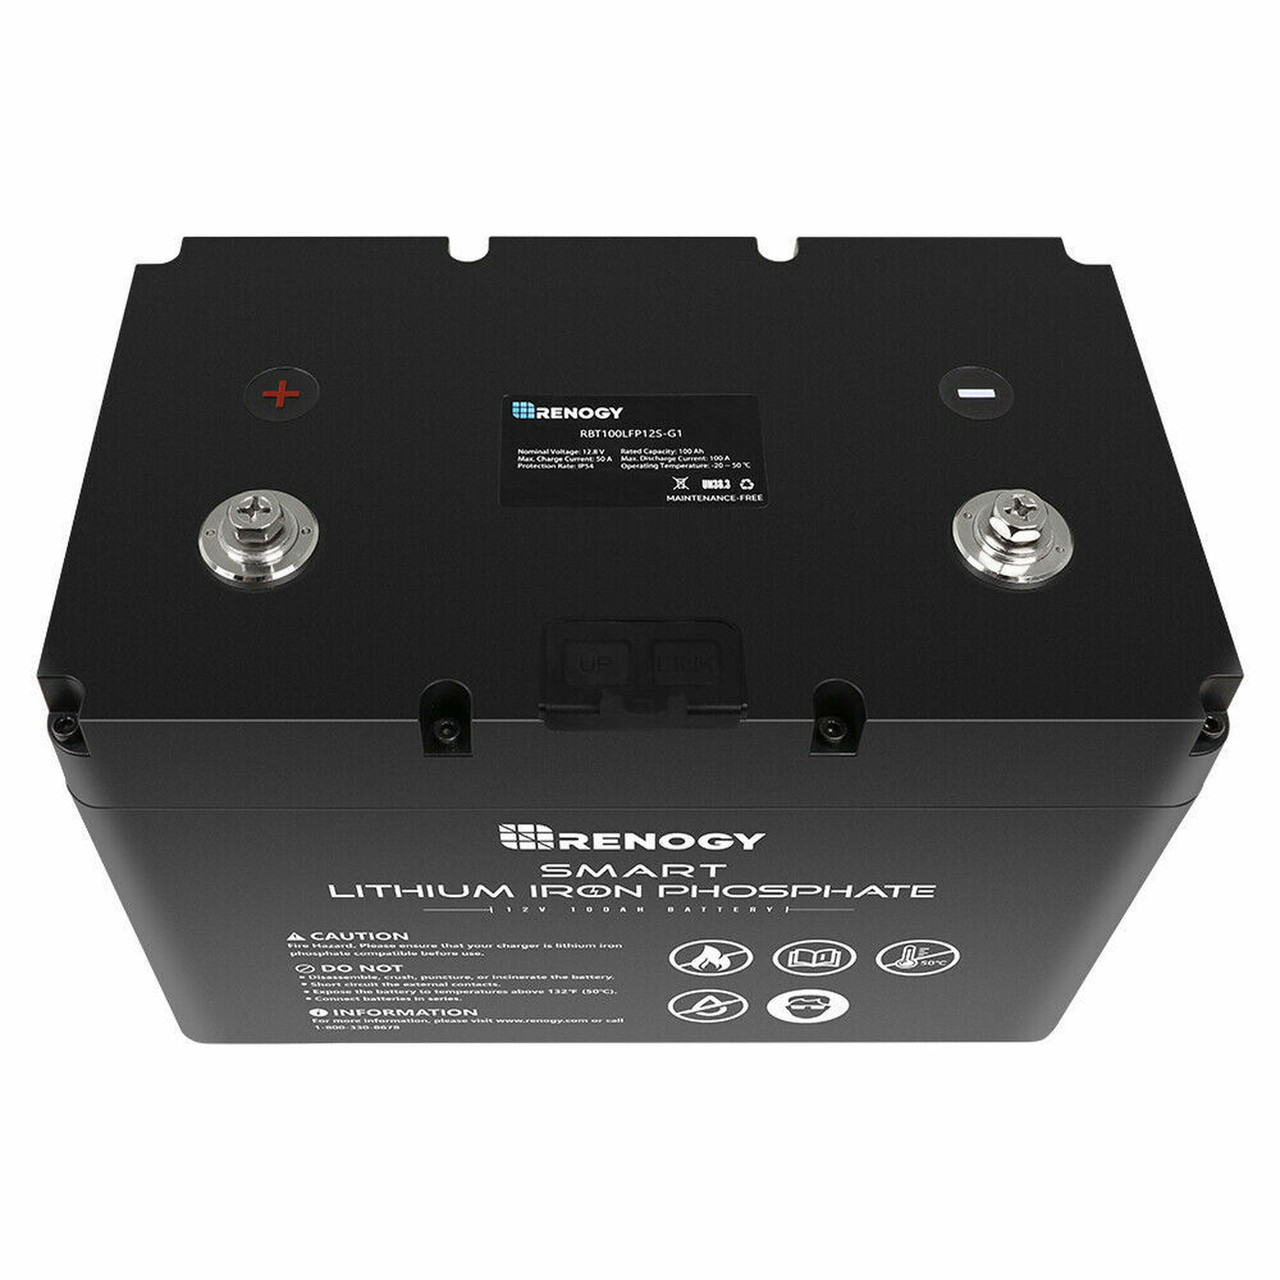 Renogy 12V 100Ah Lithium Iron Phosphate Battery